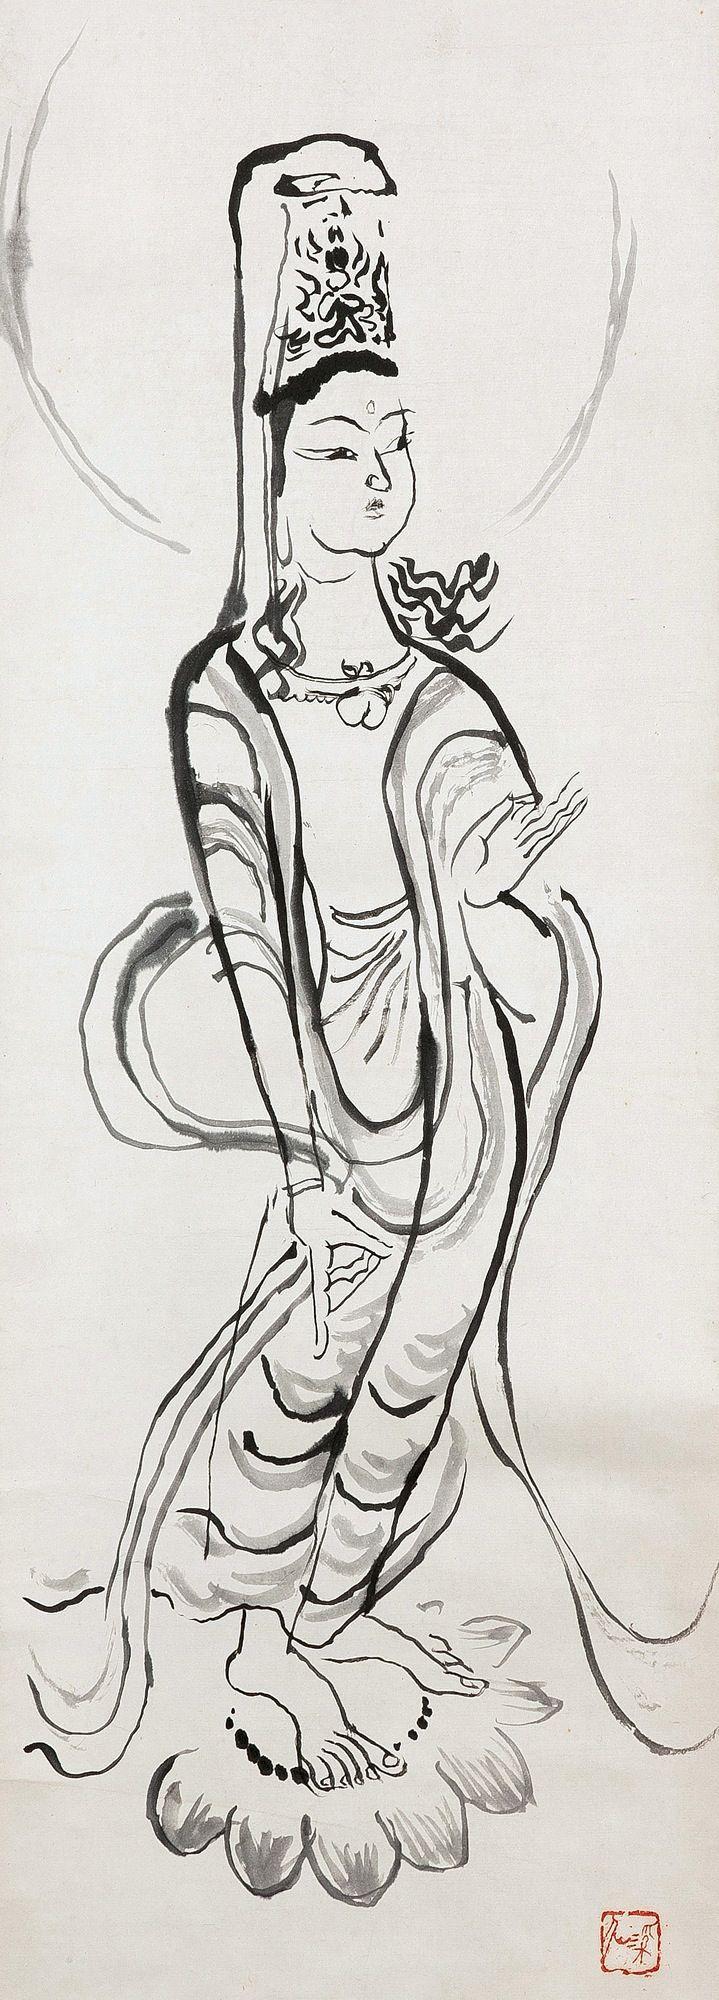 Tomita Keisen 富田渓仙 (1879-1936), Bodhisattva.